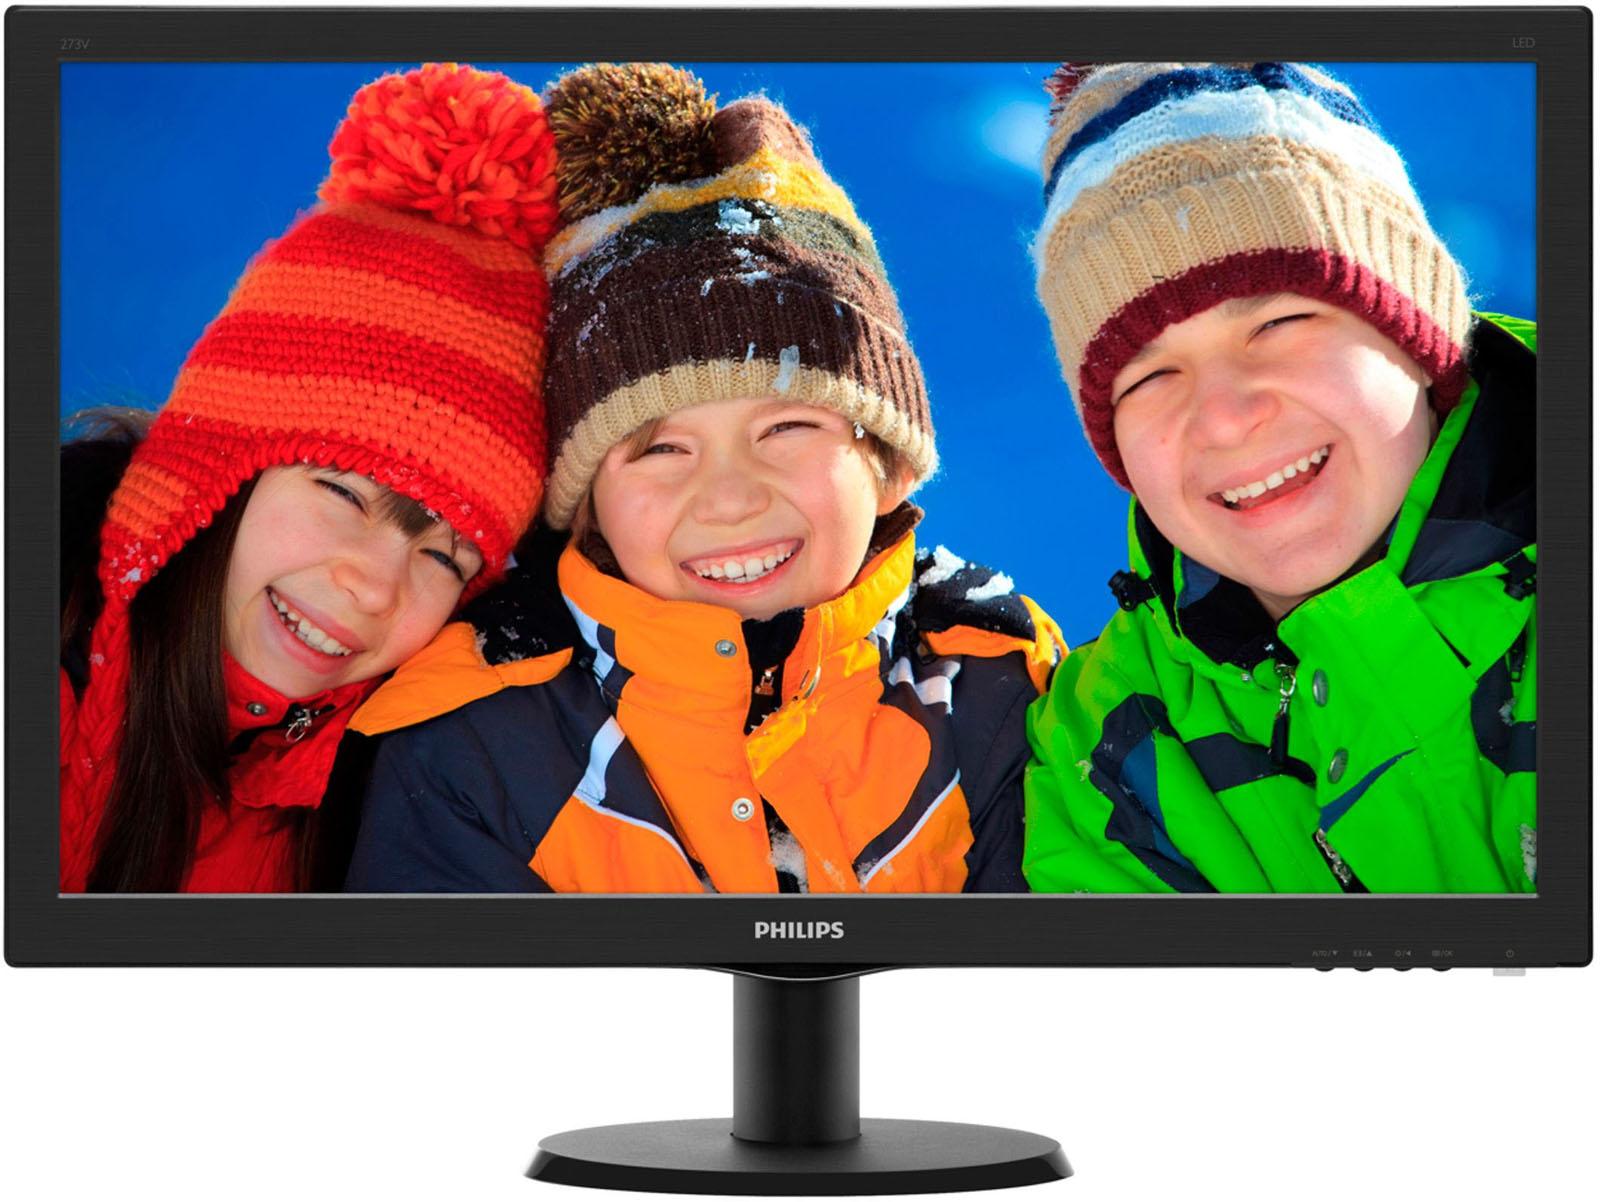 Philips monitor 273V5LHSB